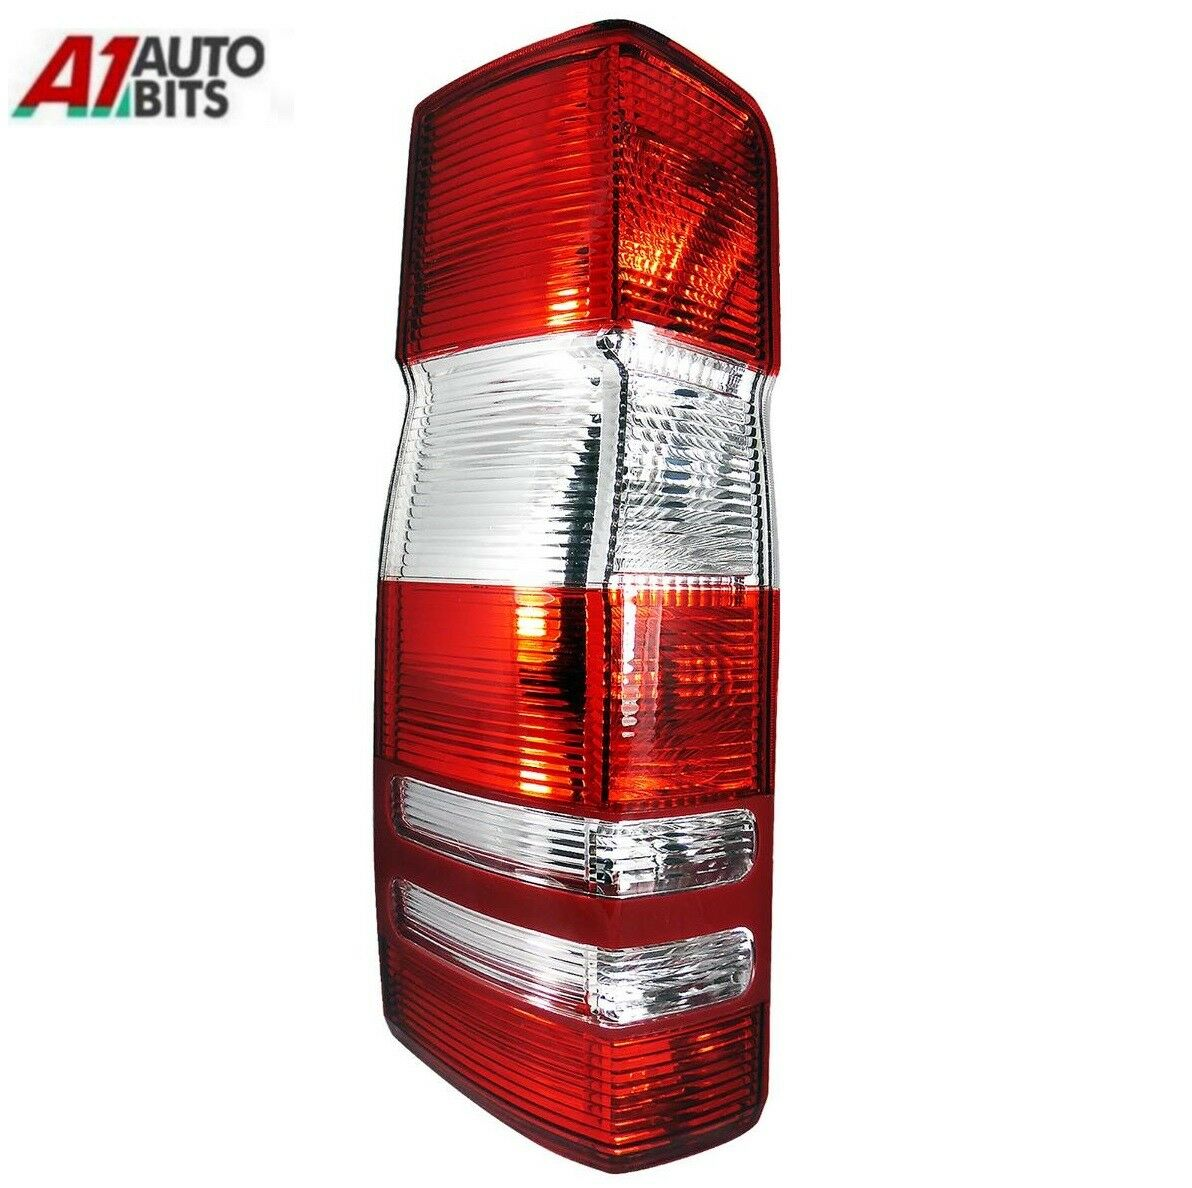 VAUXHALL CORSA D 2006-2015 3 DOOR REAR TAIL LIGHT LAMP LH LEFT N//S NEAR SIDE